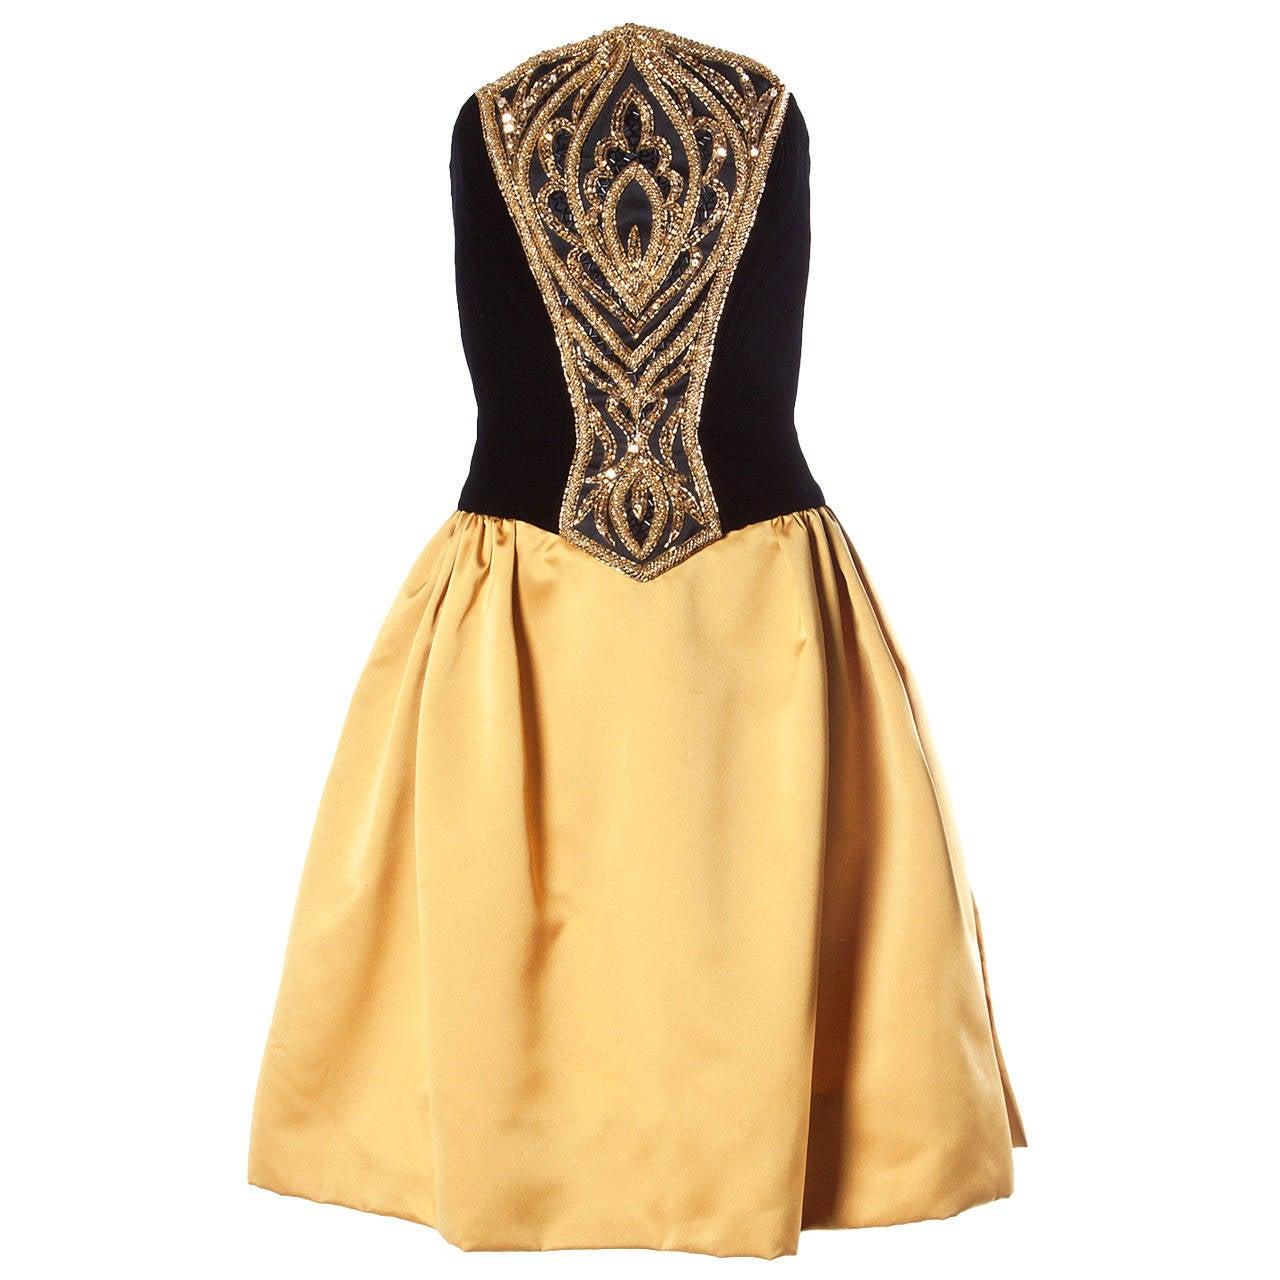 Bob Mackie Vintage 1990s Strapless Black + Gold Beaded Evening Dress 1